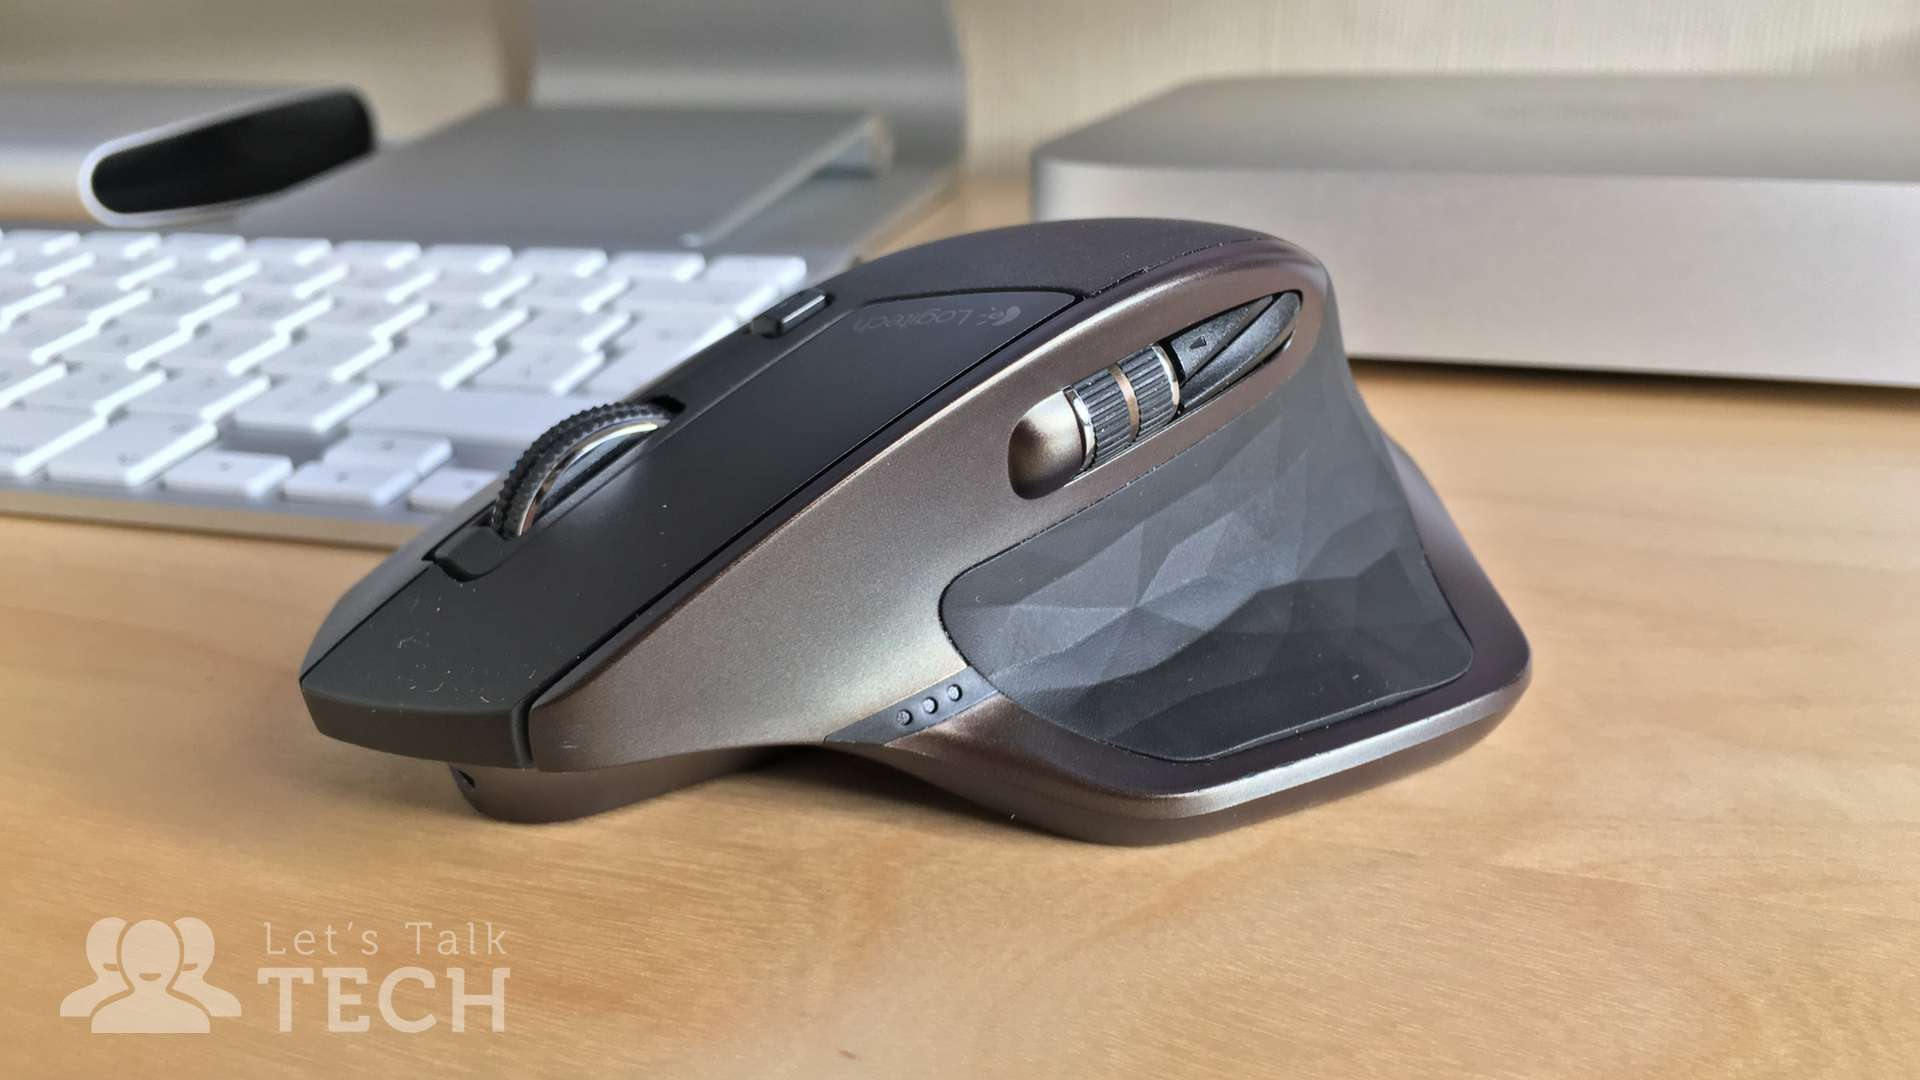 Logitech-MX-Master-Mouse-Buttons